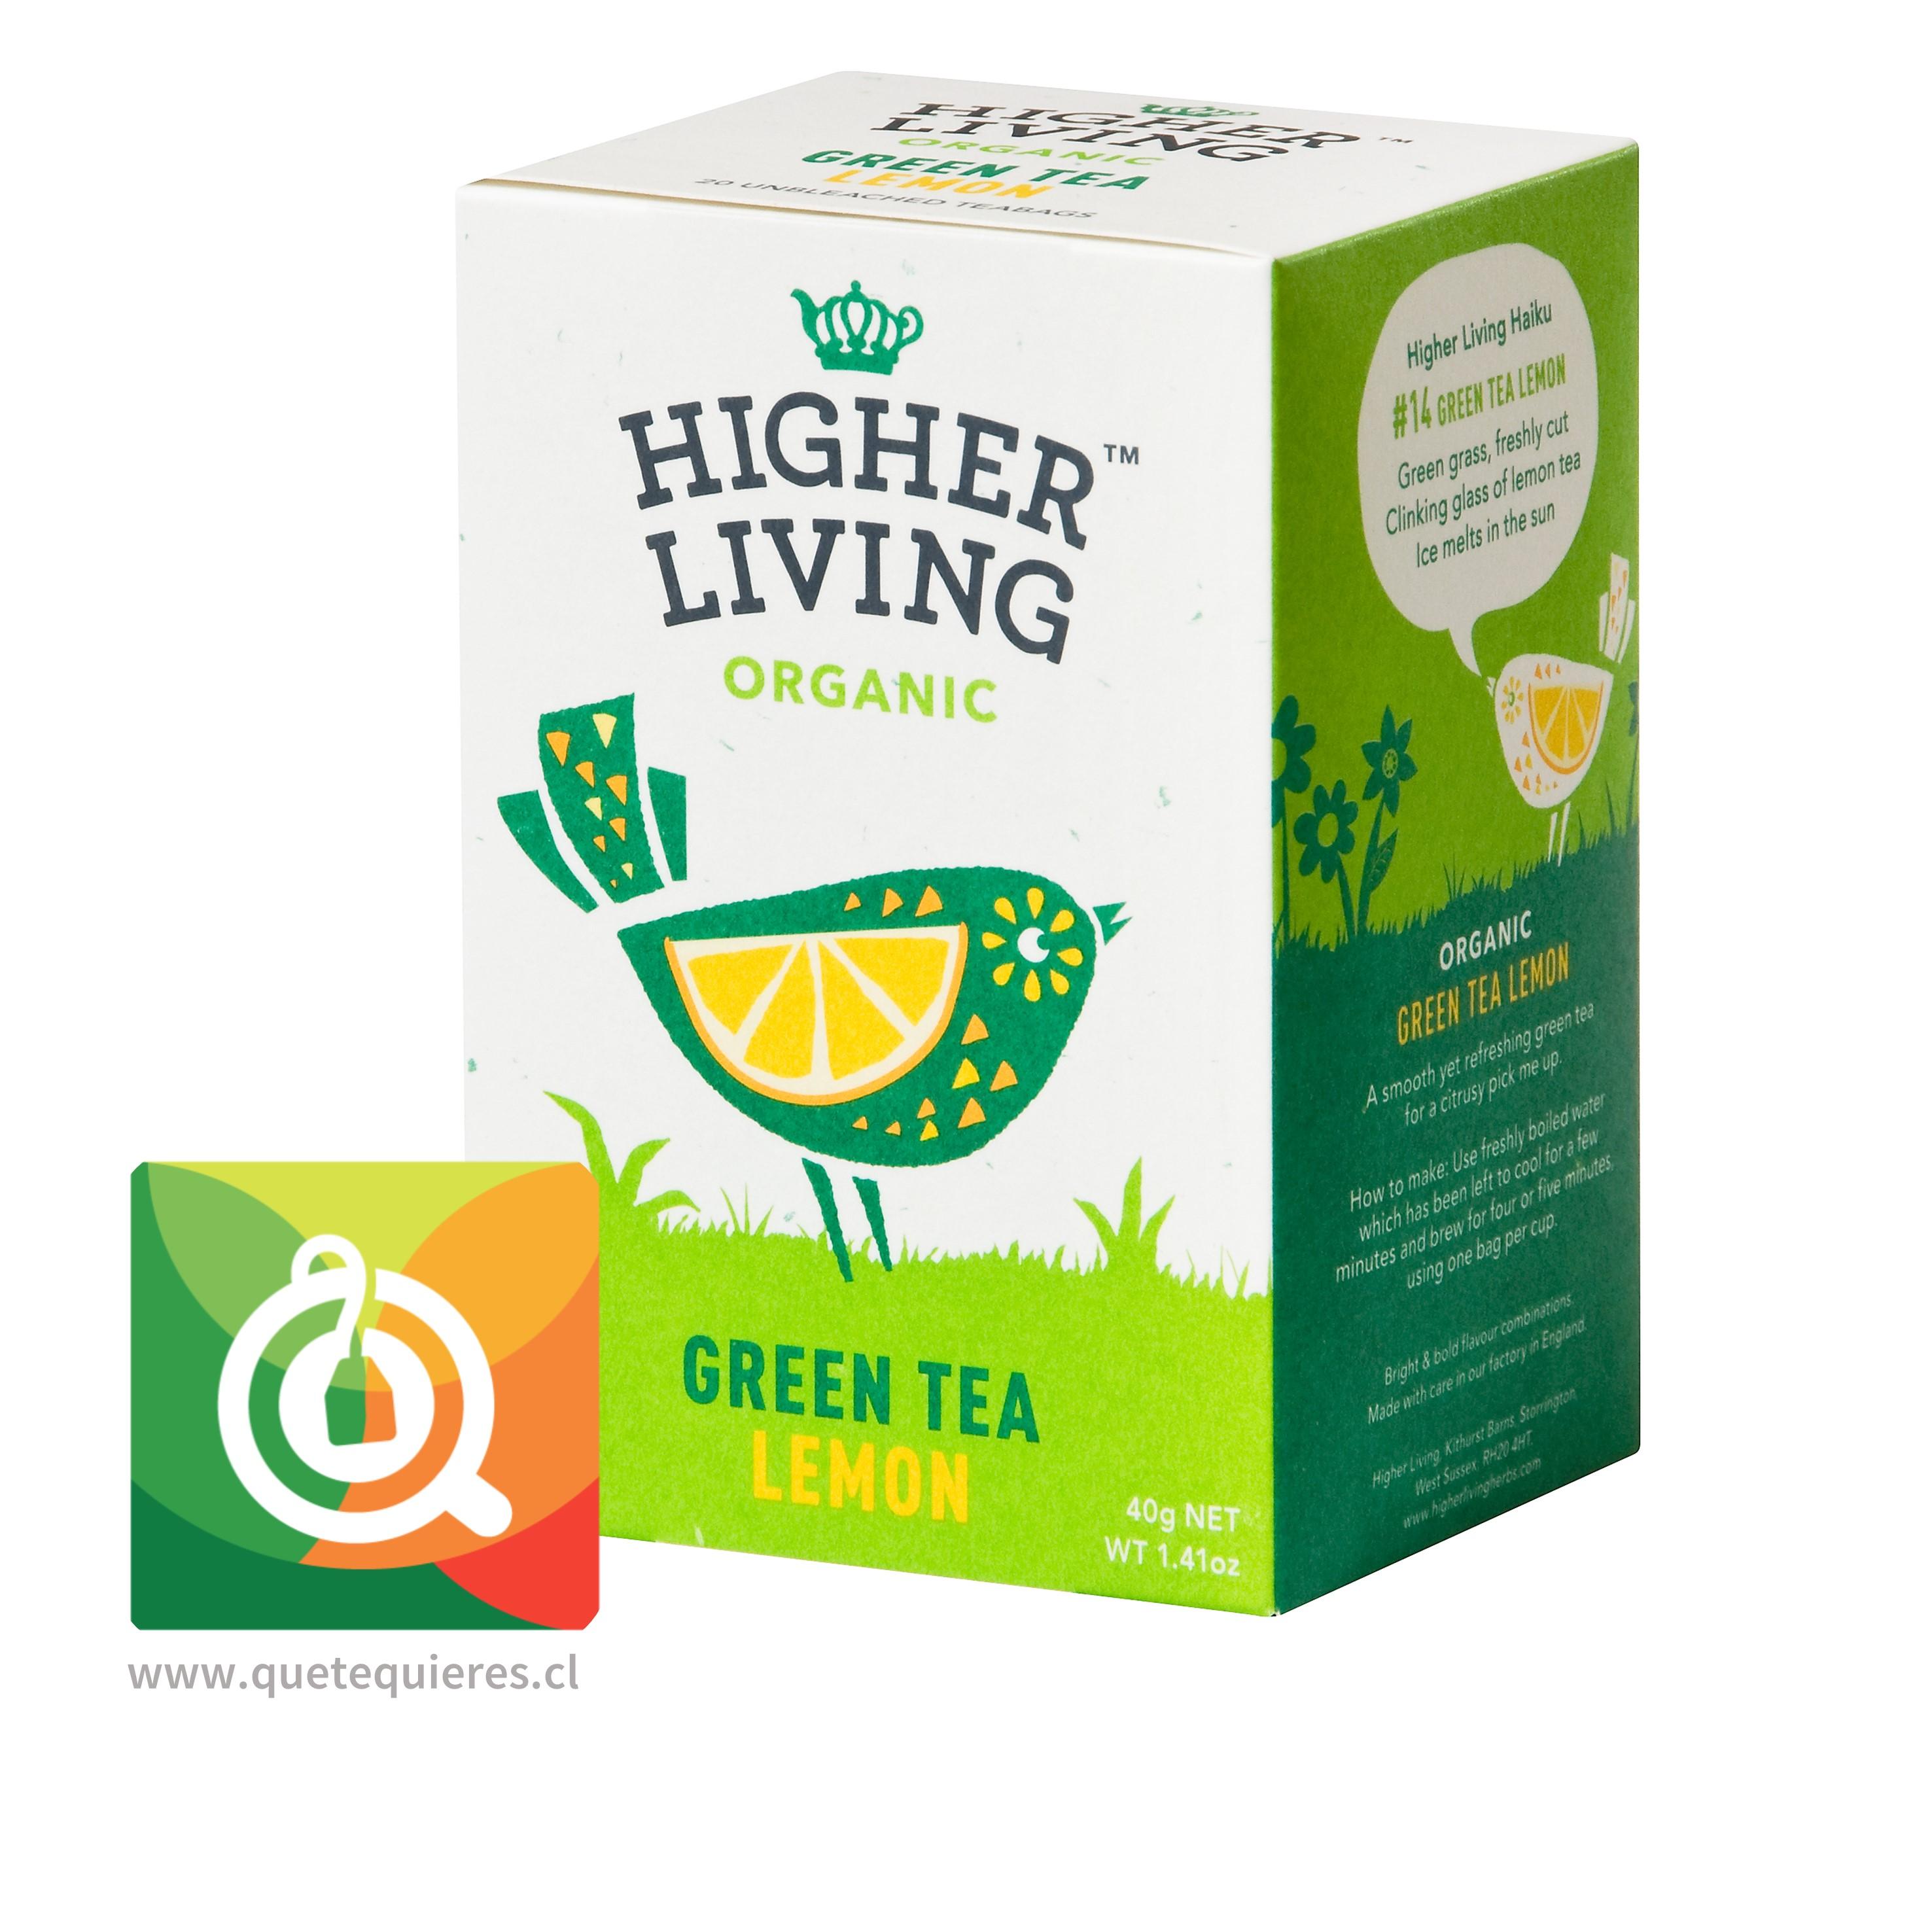 Higher Living Té Verde Orgánico Limón - Organic Green Tea Lemon